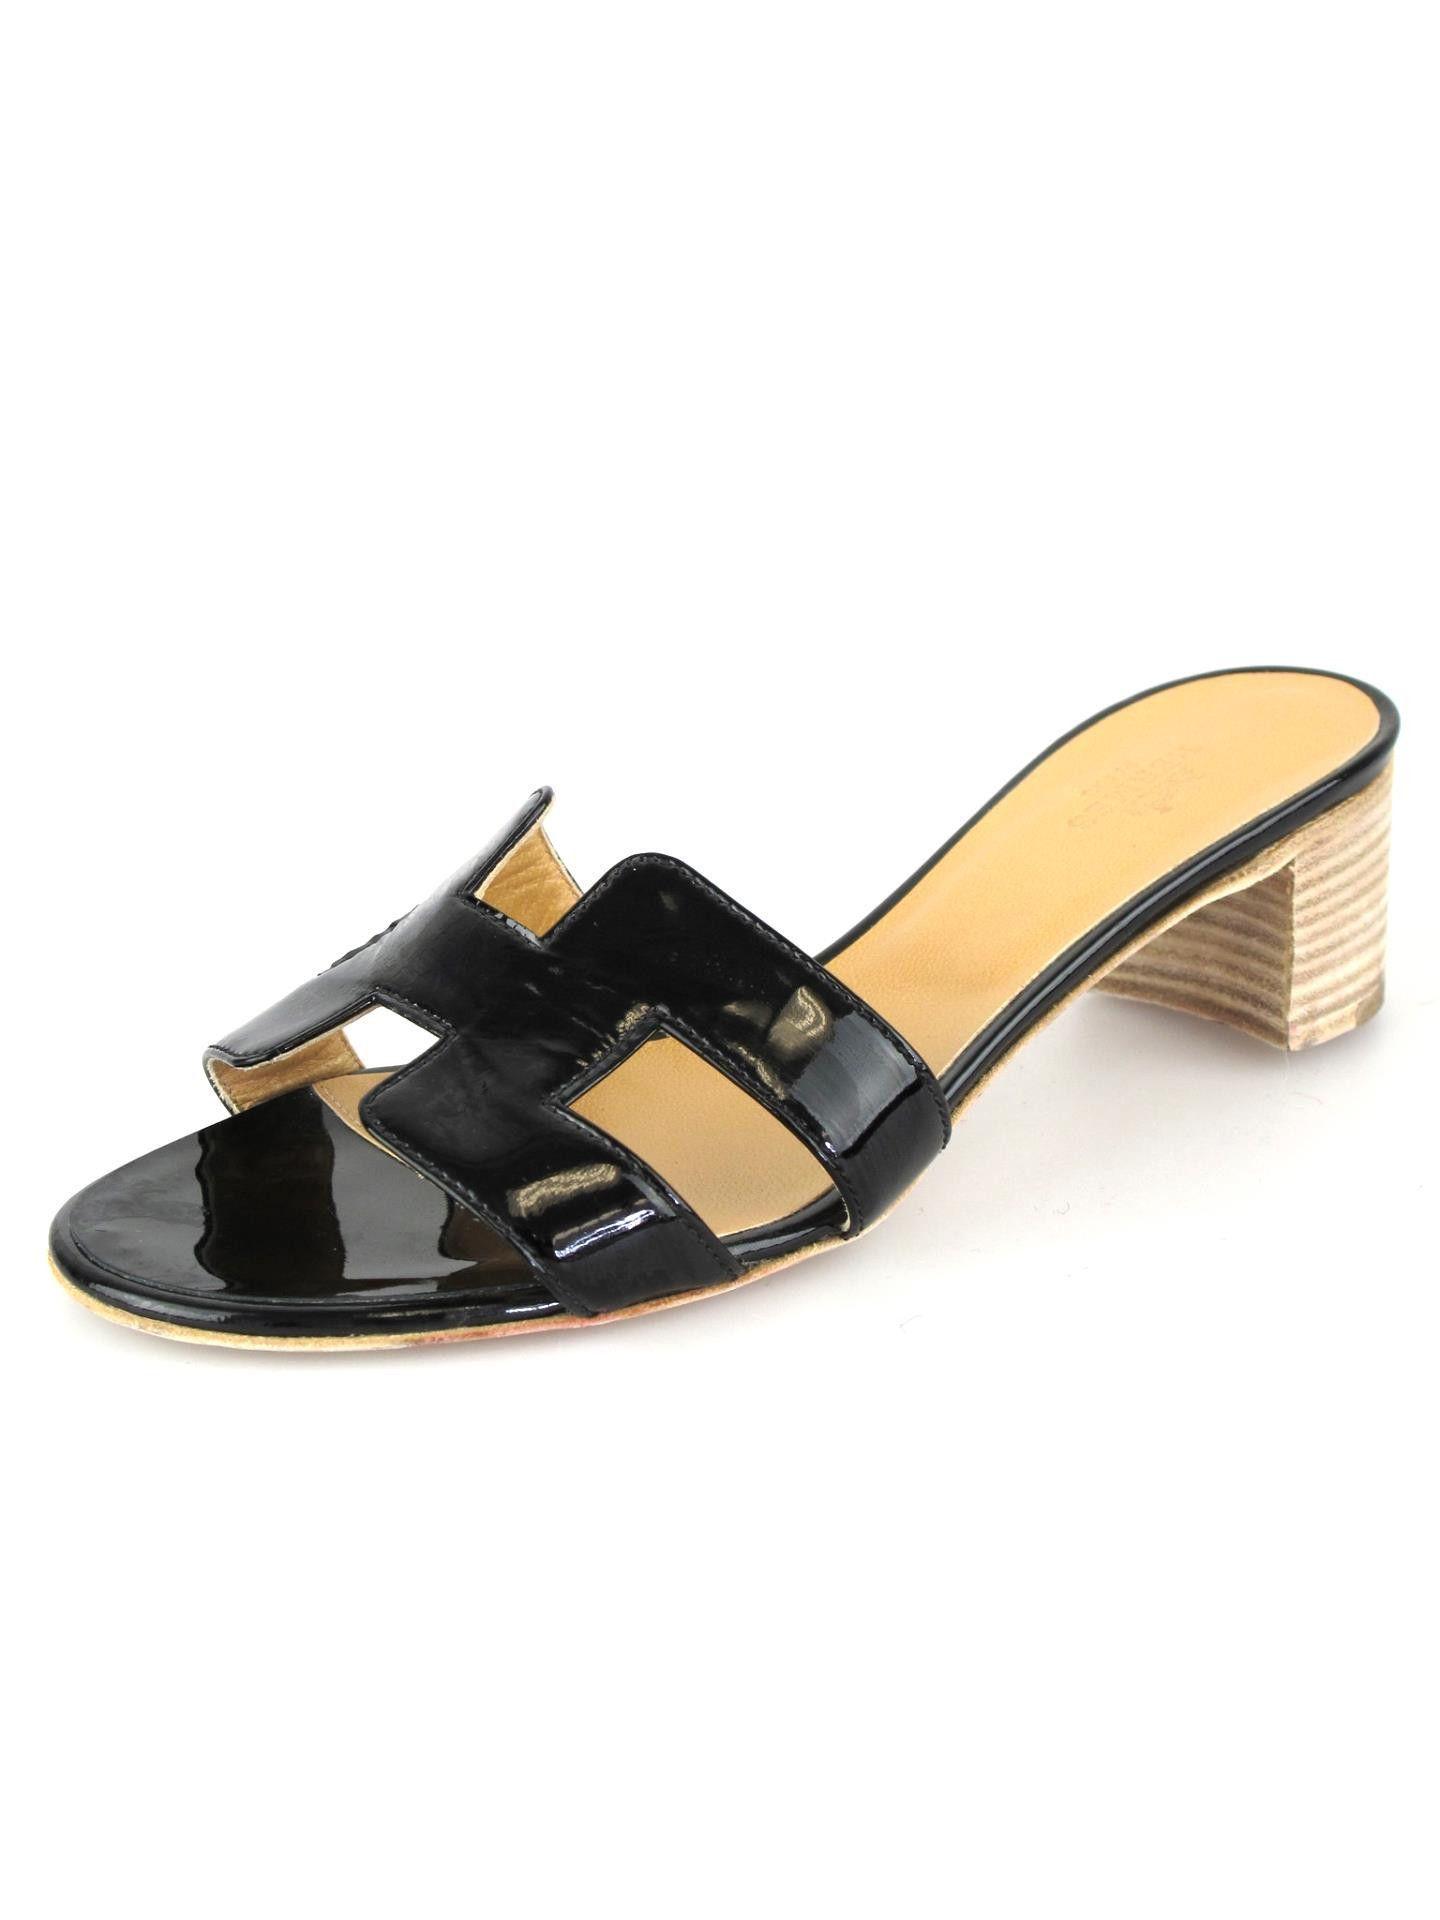 1bd7b5078fc6 HERMES Oasis H Oran Black Patent Leather Sandal   SHOP SOCIALITE ...